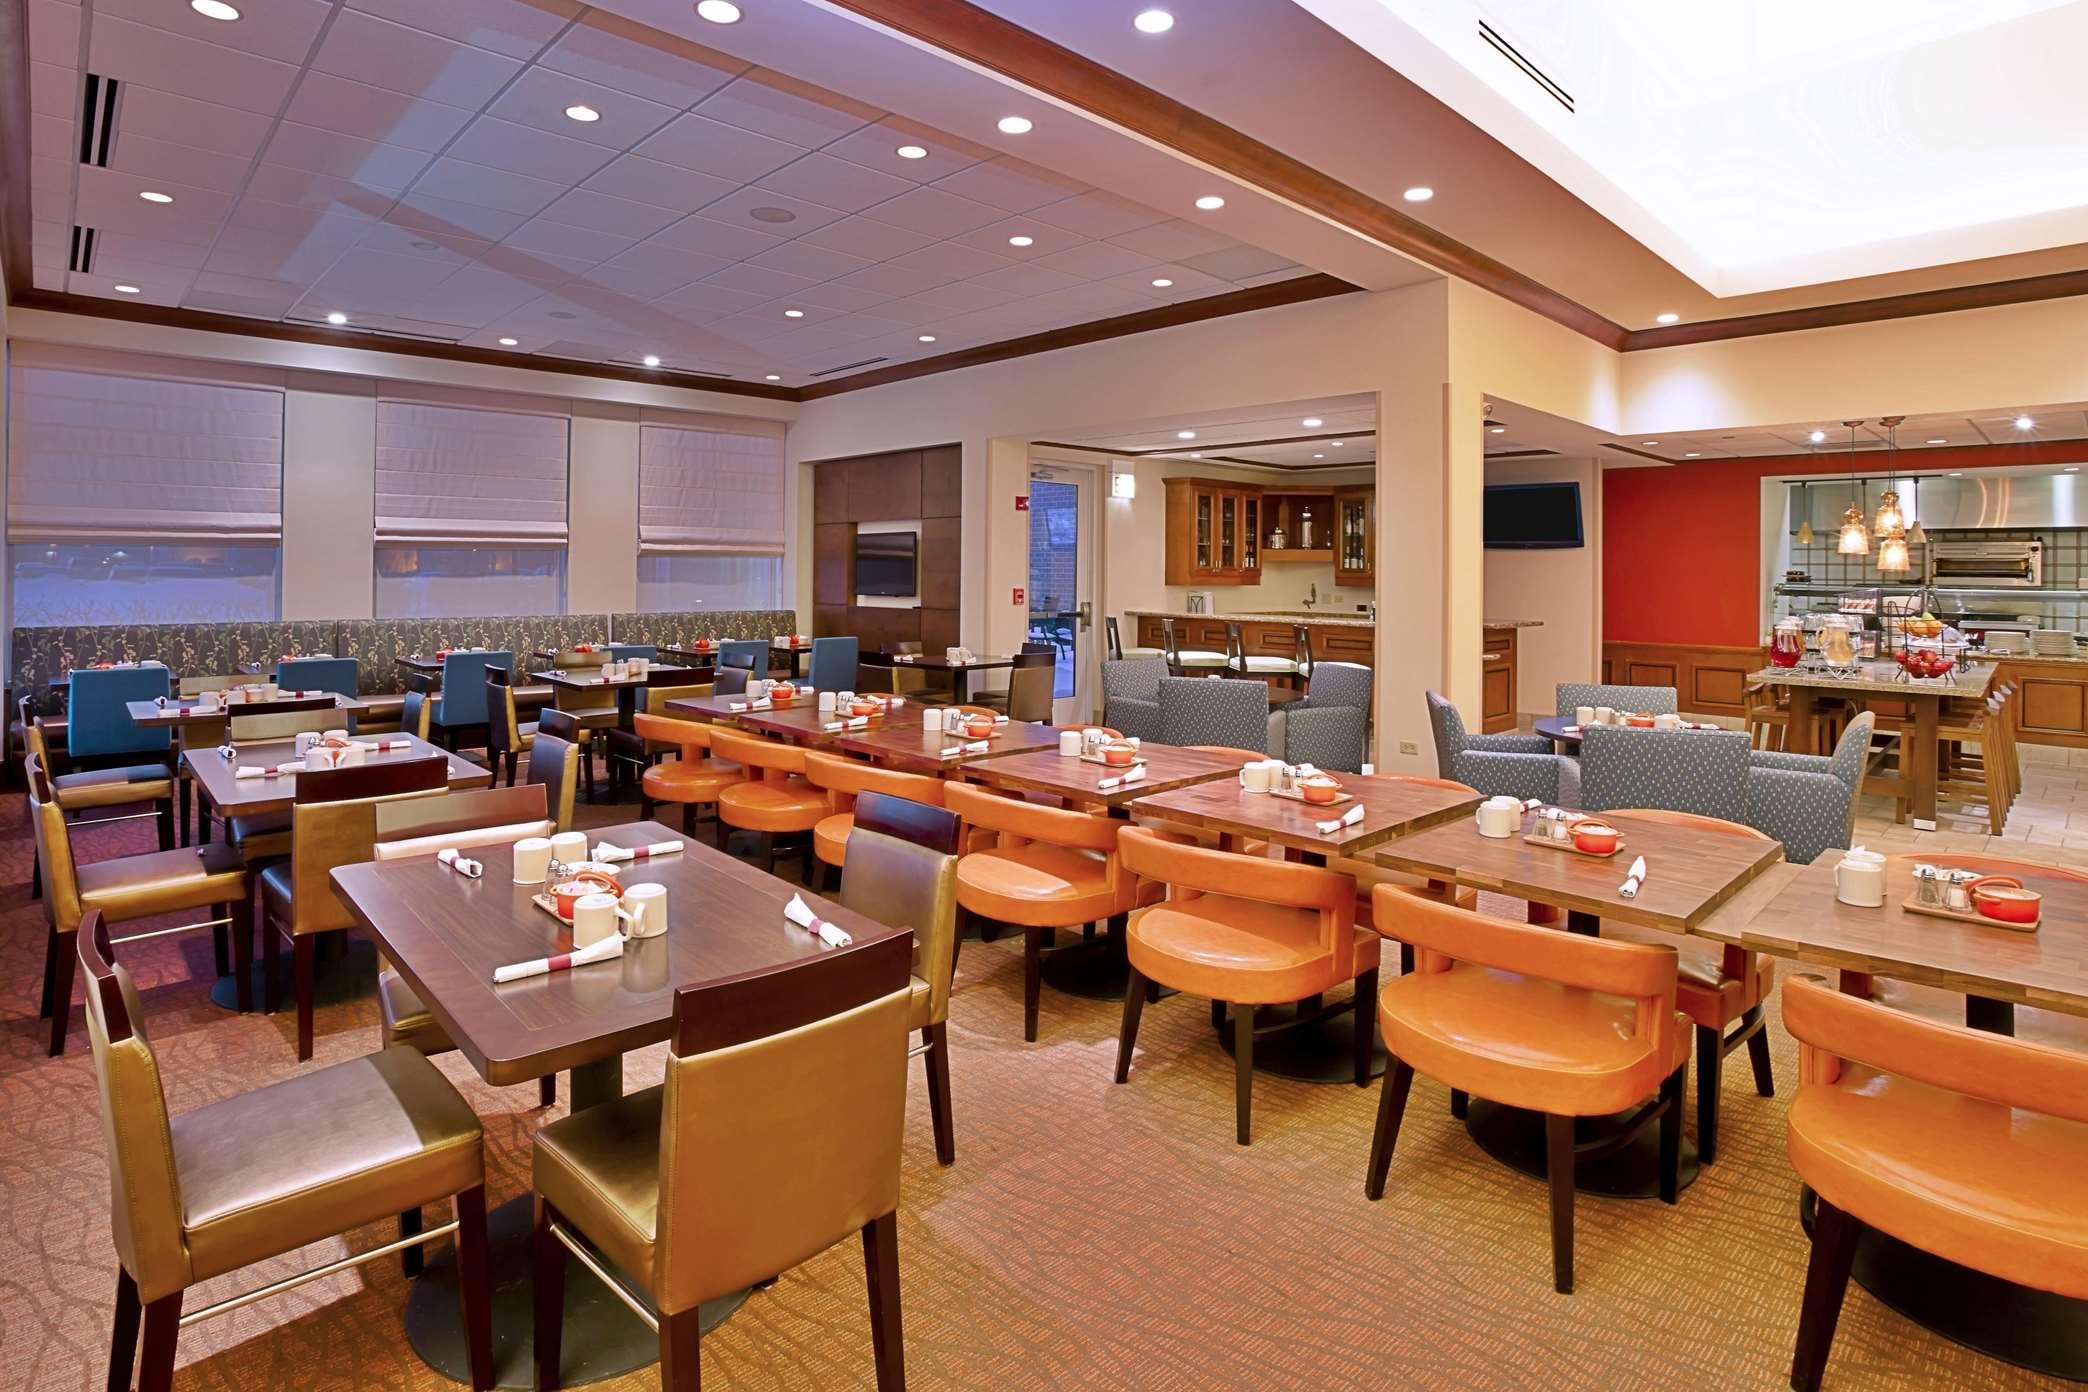 Hilton Garden Inn Chicago/Midway Airport image 5